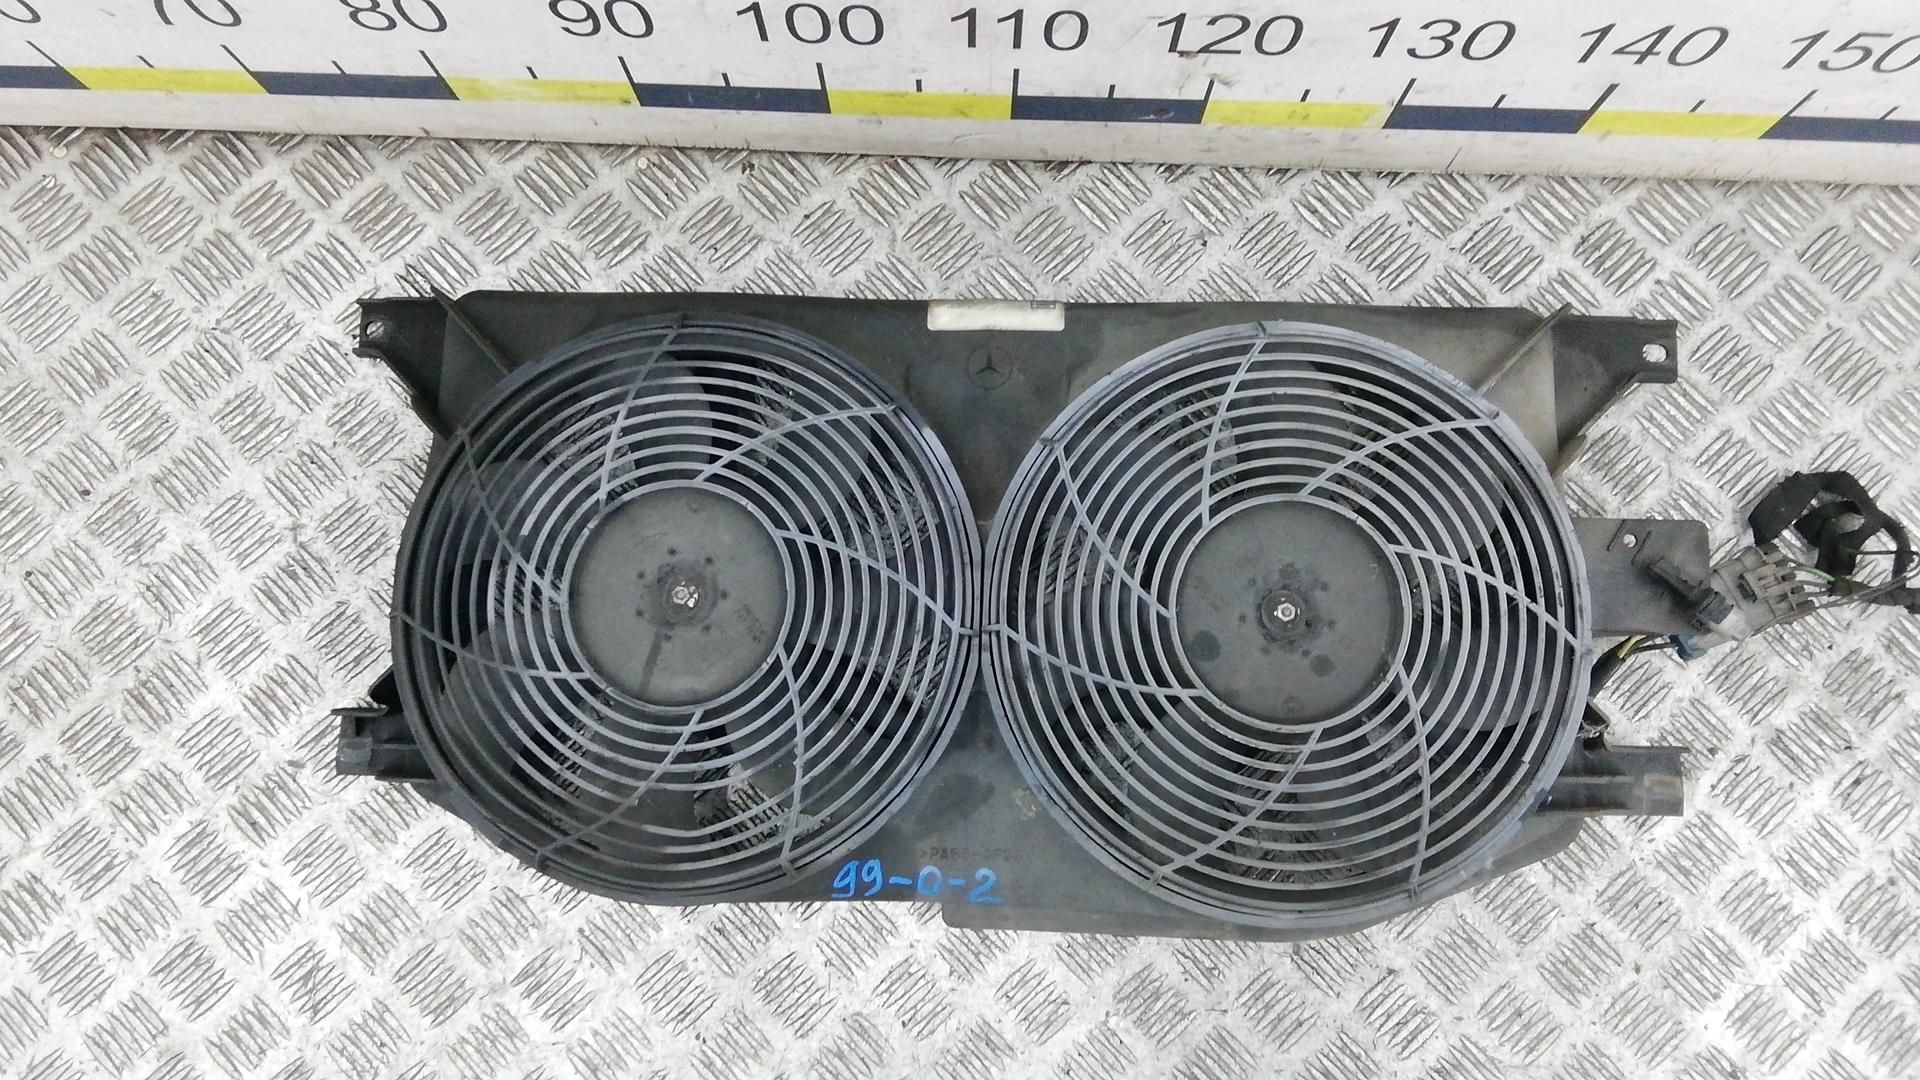 Вентилятор радиатора, MERCEDES BENZ, M-CLASS W163, 1999